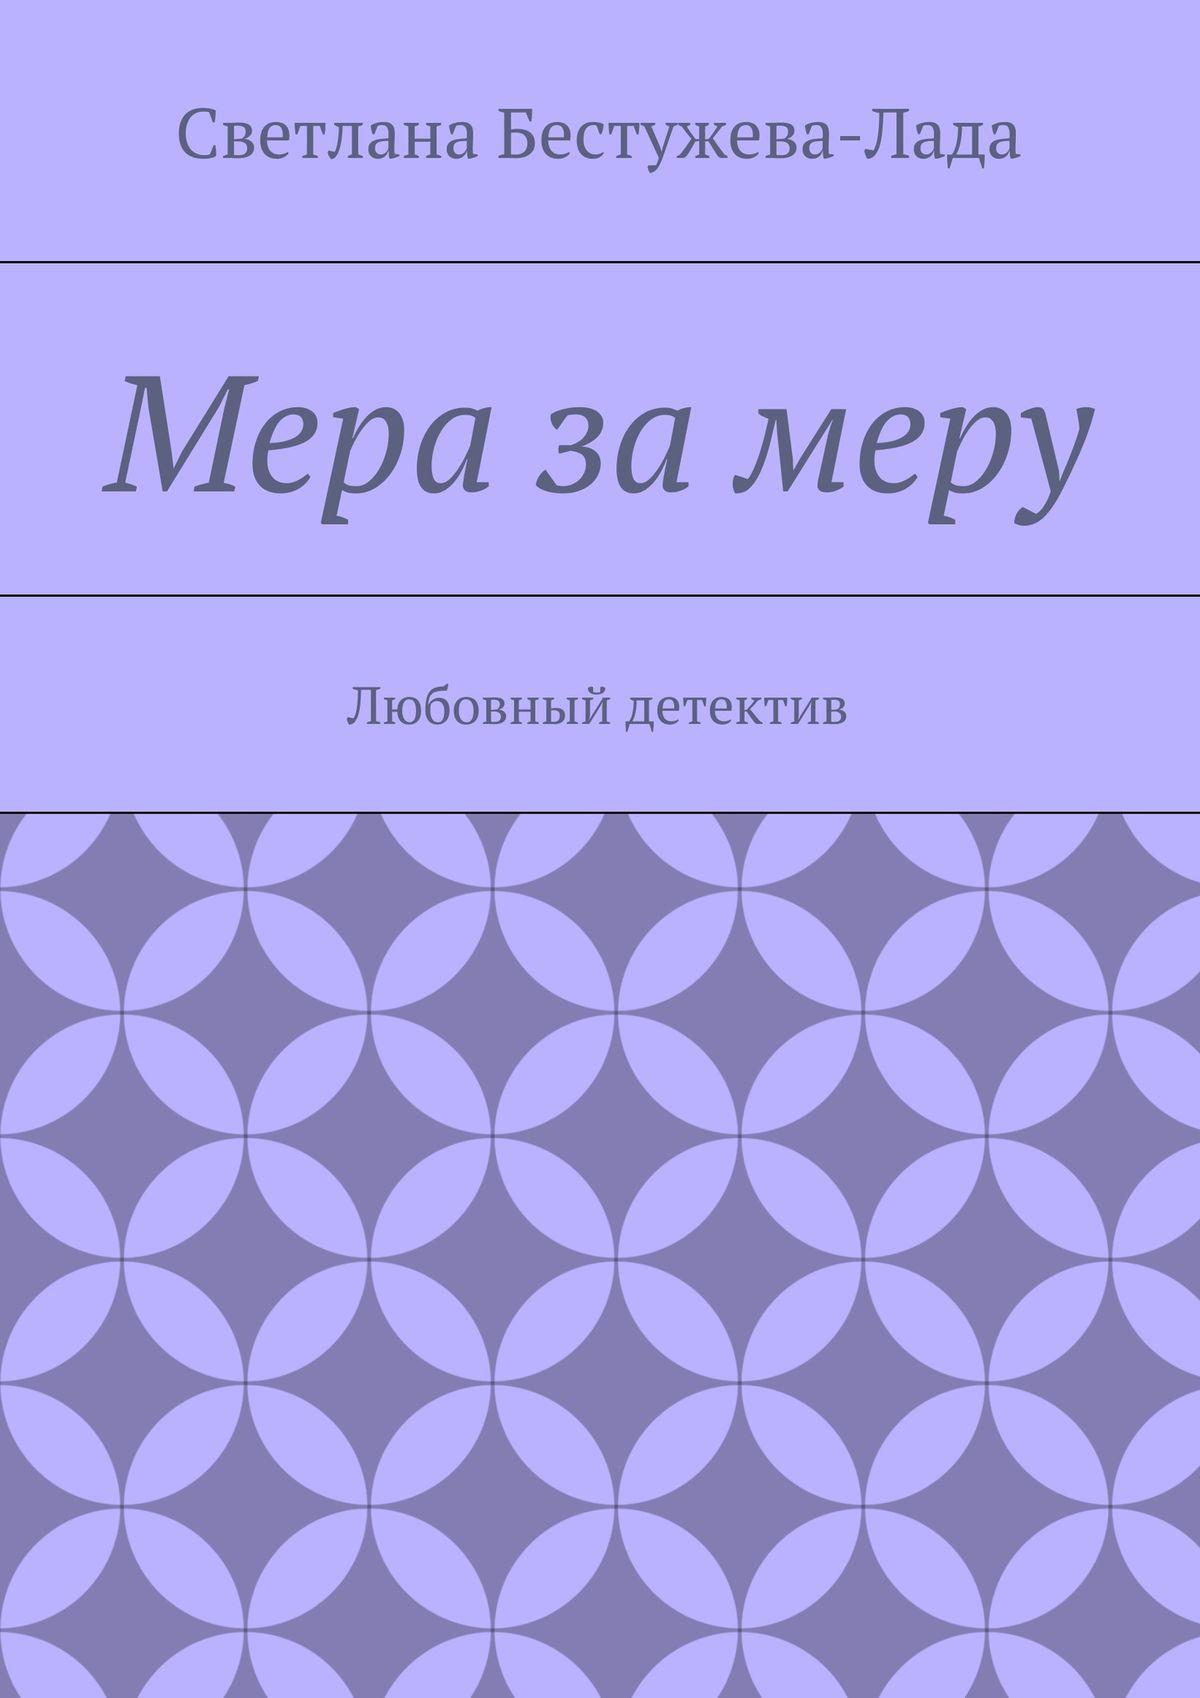 Светлана Игоревна Бестужева-Лада Мера за меру